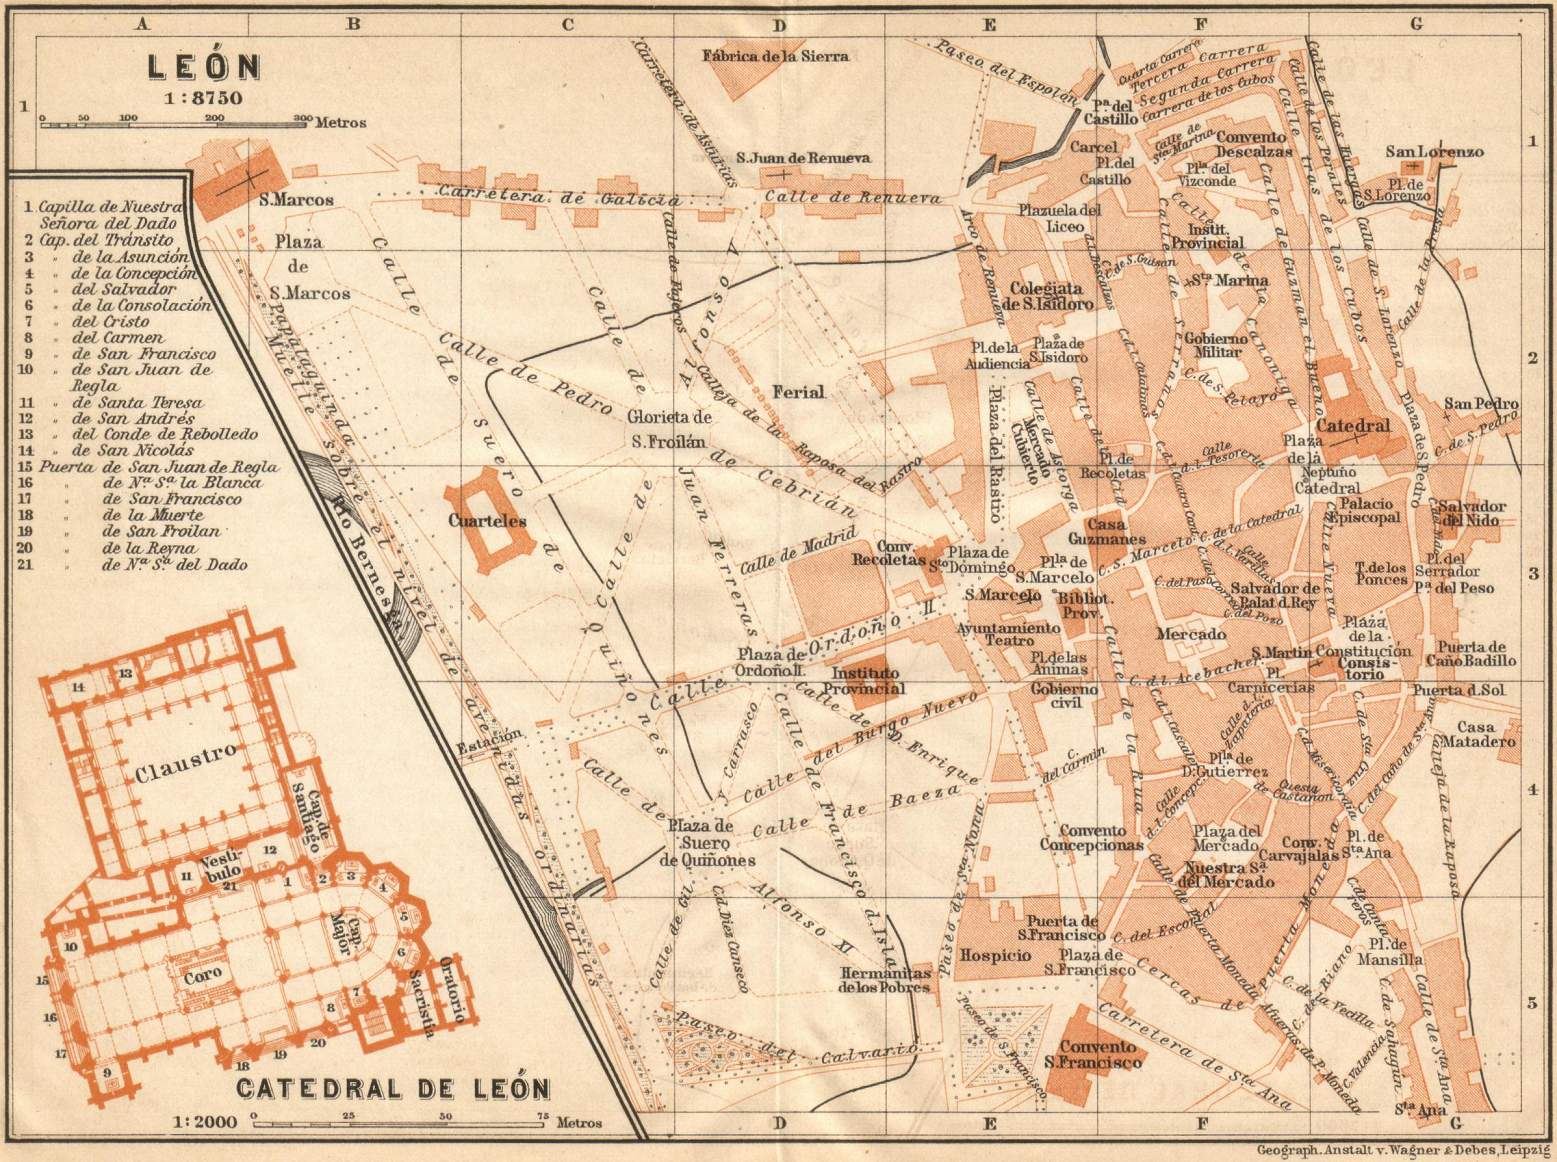 León map 1901